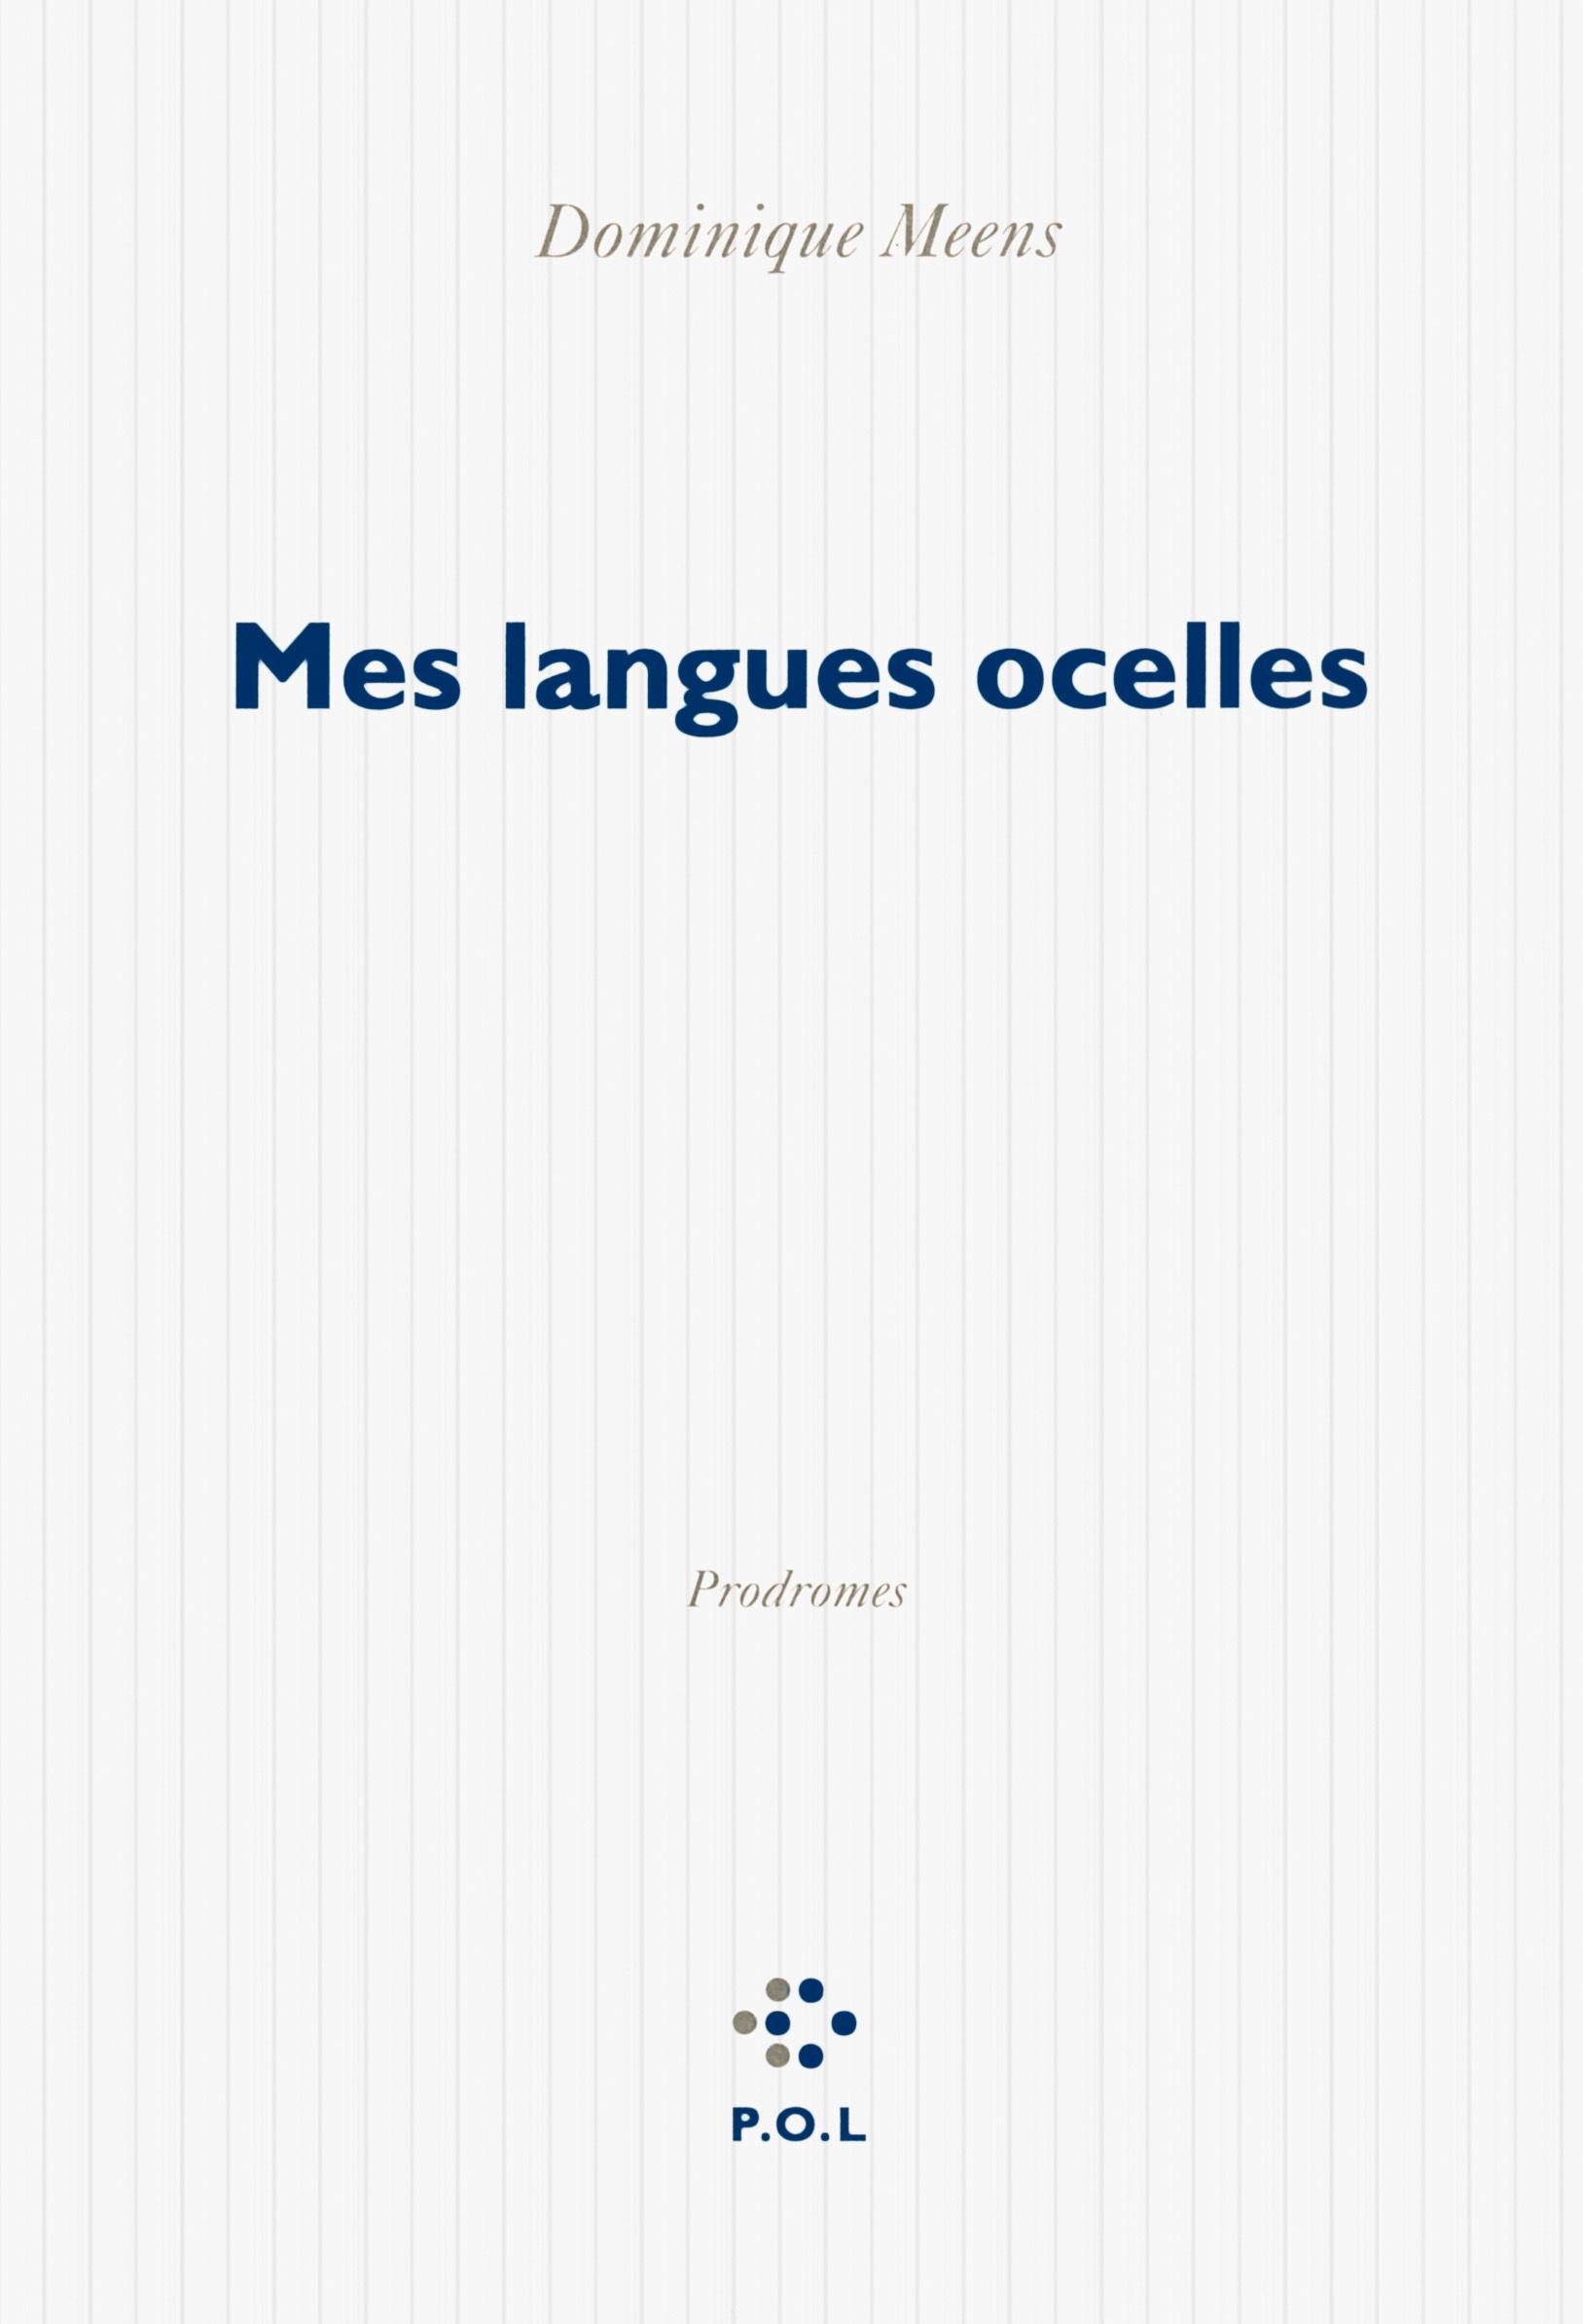 DU SIGNIFIANT DANS LA NATURE, I : MES LANGUES OCELLES - PRODROMES